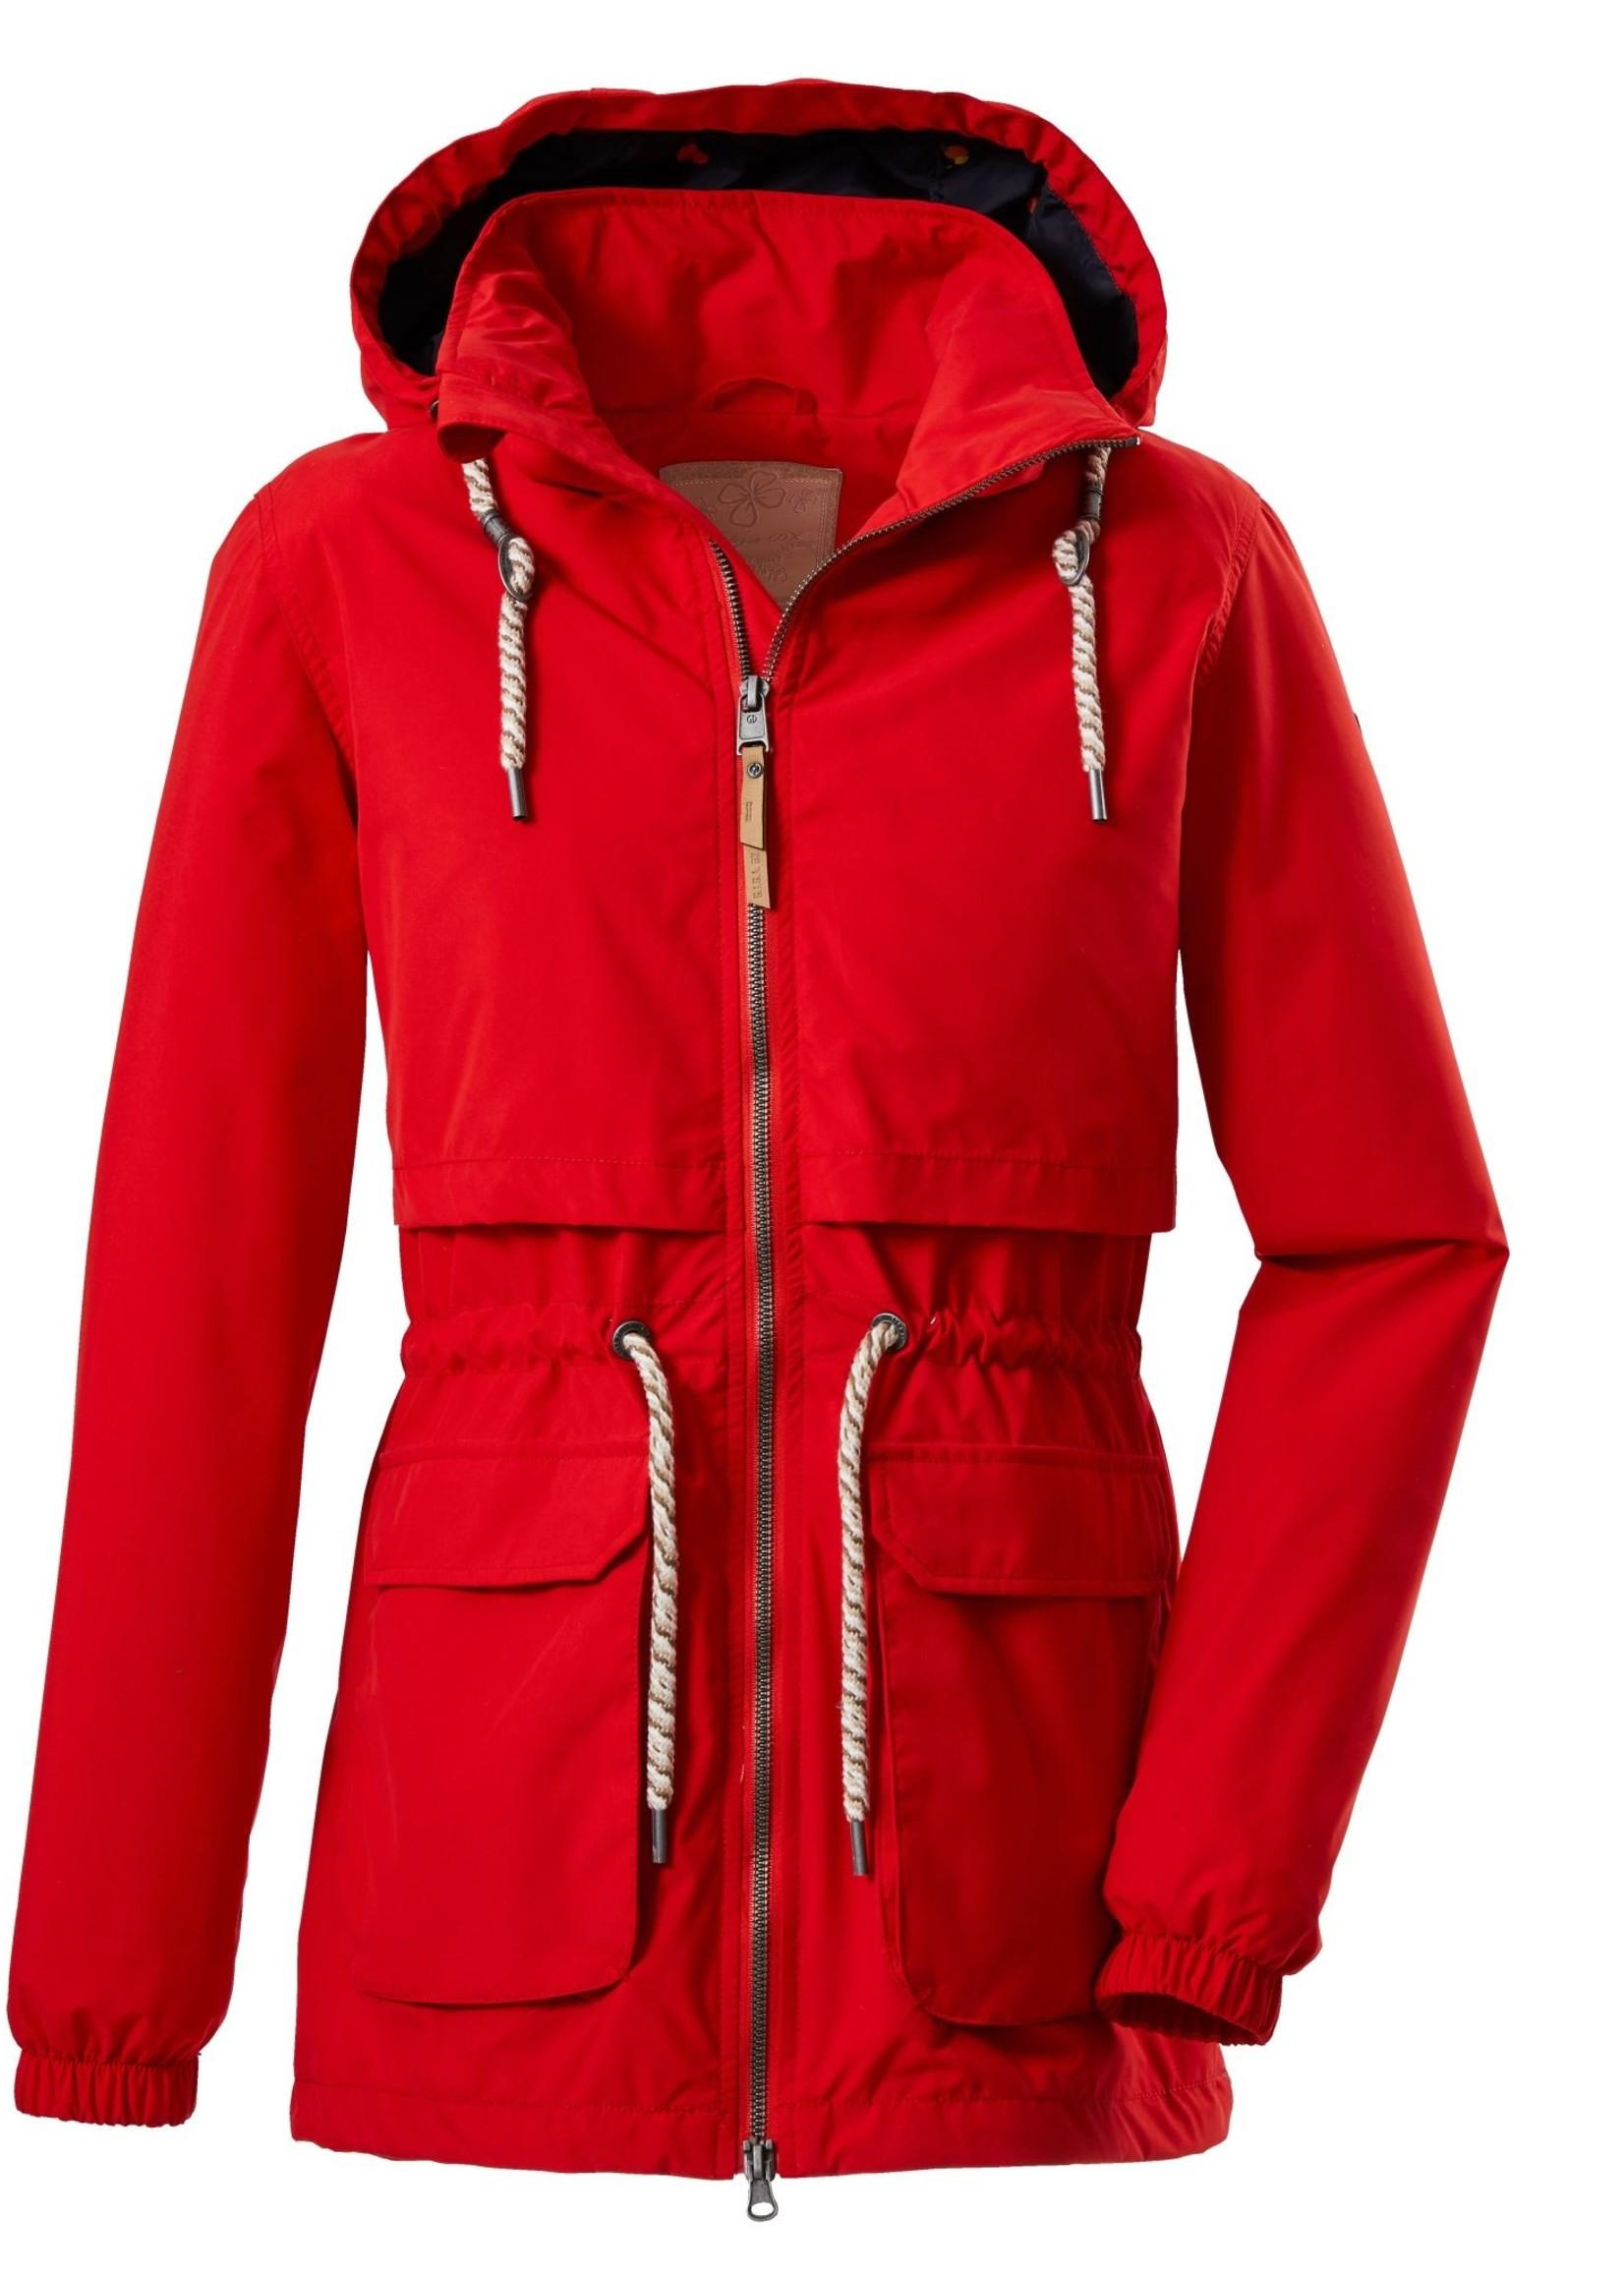 GIGA Jamil Casual Functional Jacket with Zip-off Hood 36763